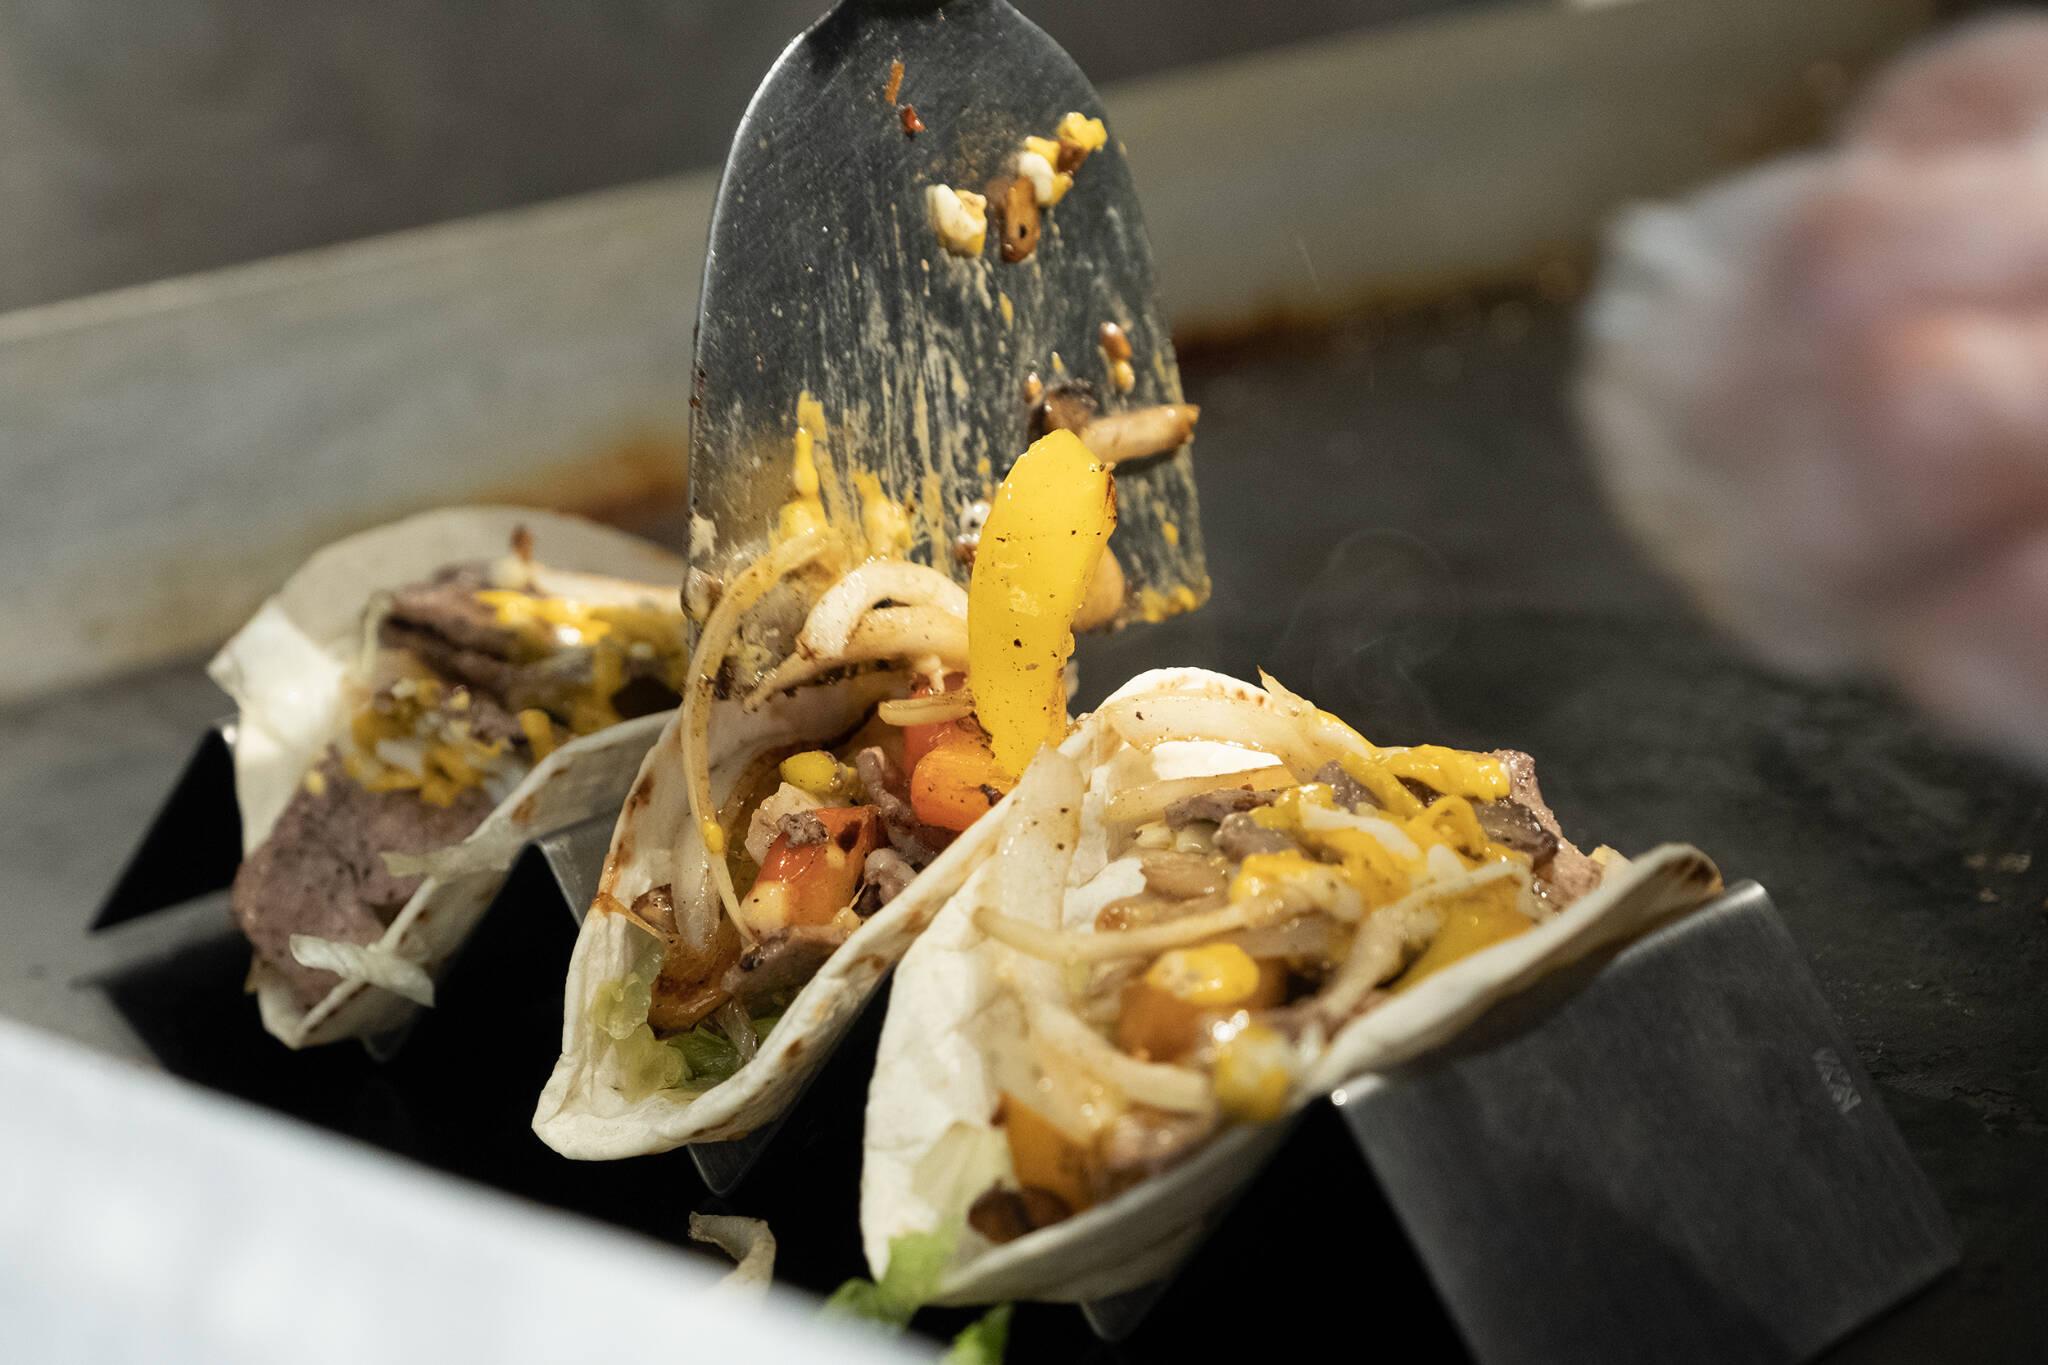 mexi burrito corner toronto